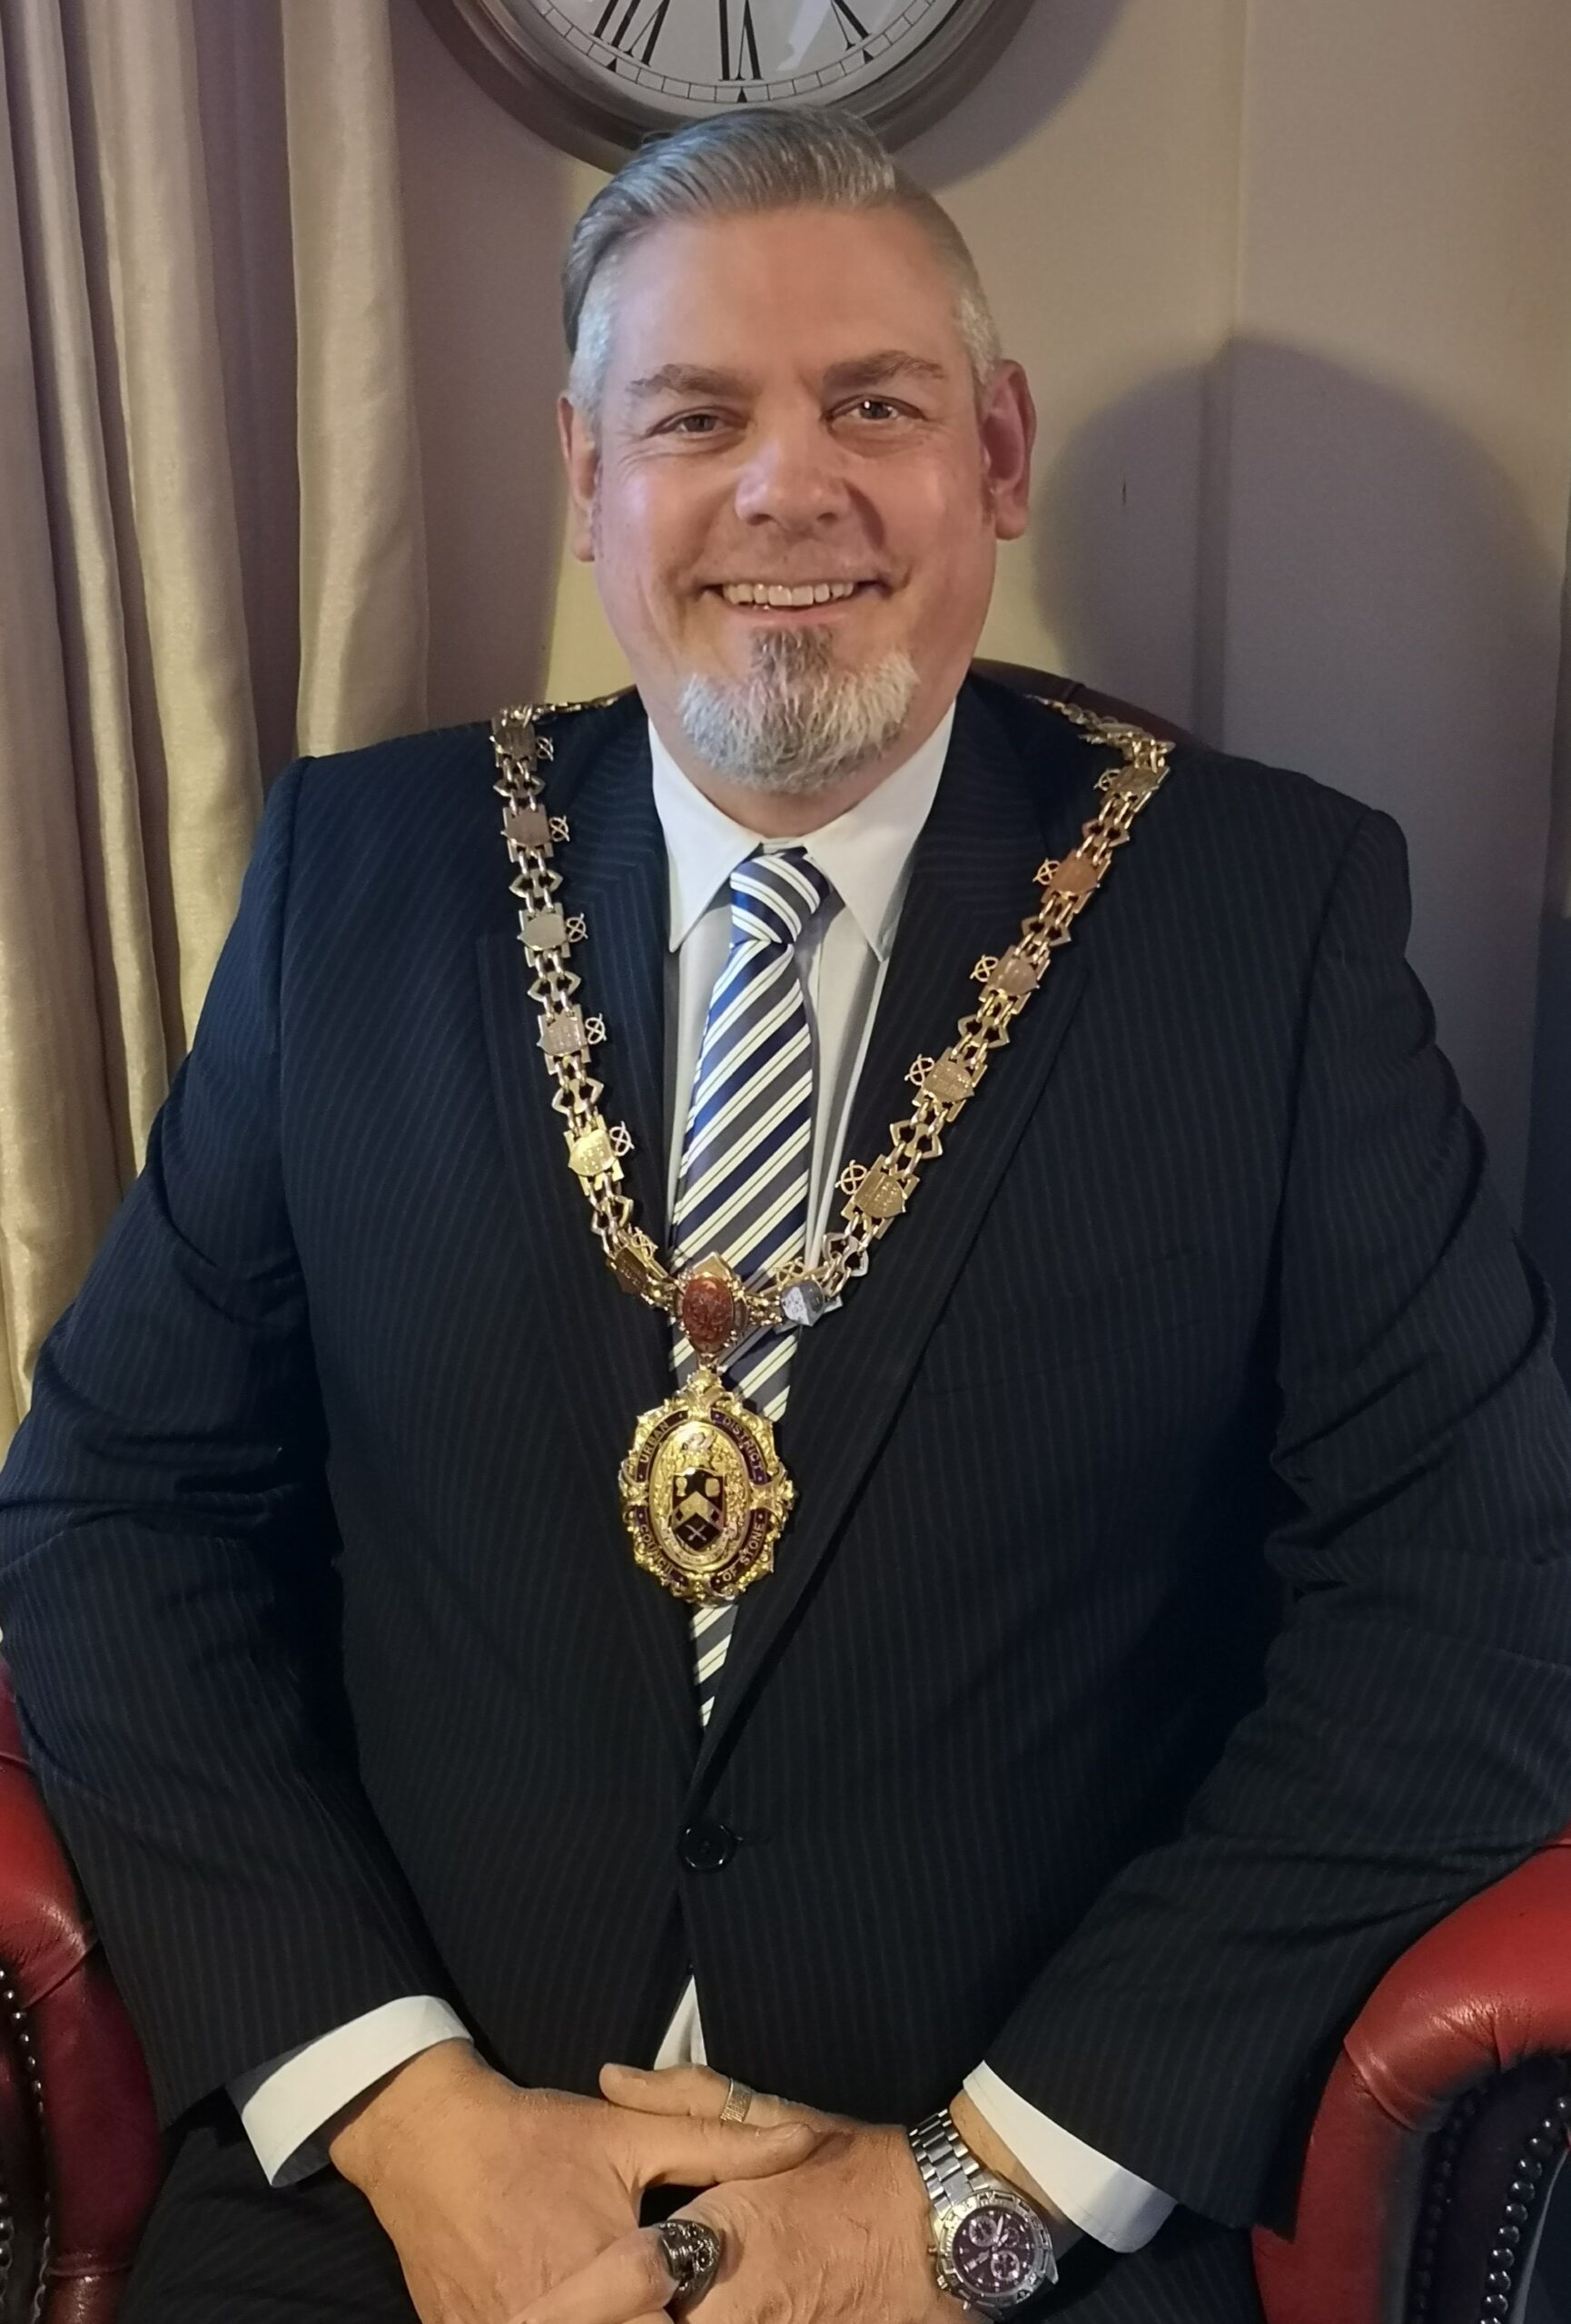 Jonathan Powell, Town Mayor